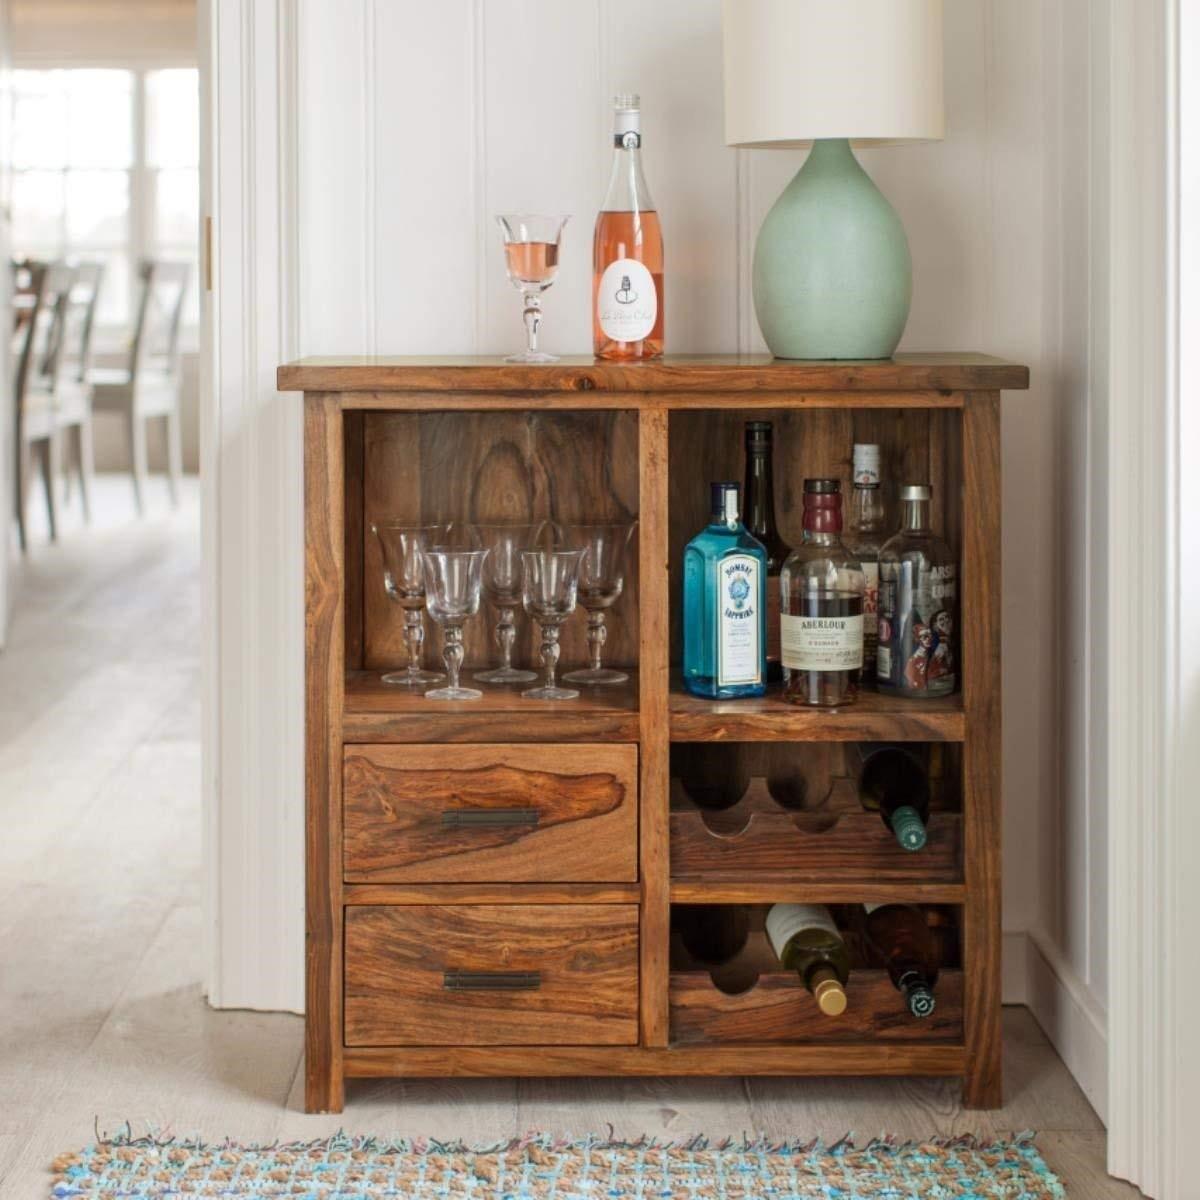 Nevil Bar Sheesham Wood Bar Cabinet | for Home & Living Room | Liquor Storage | with Wine Glass Storage | Brown